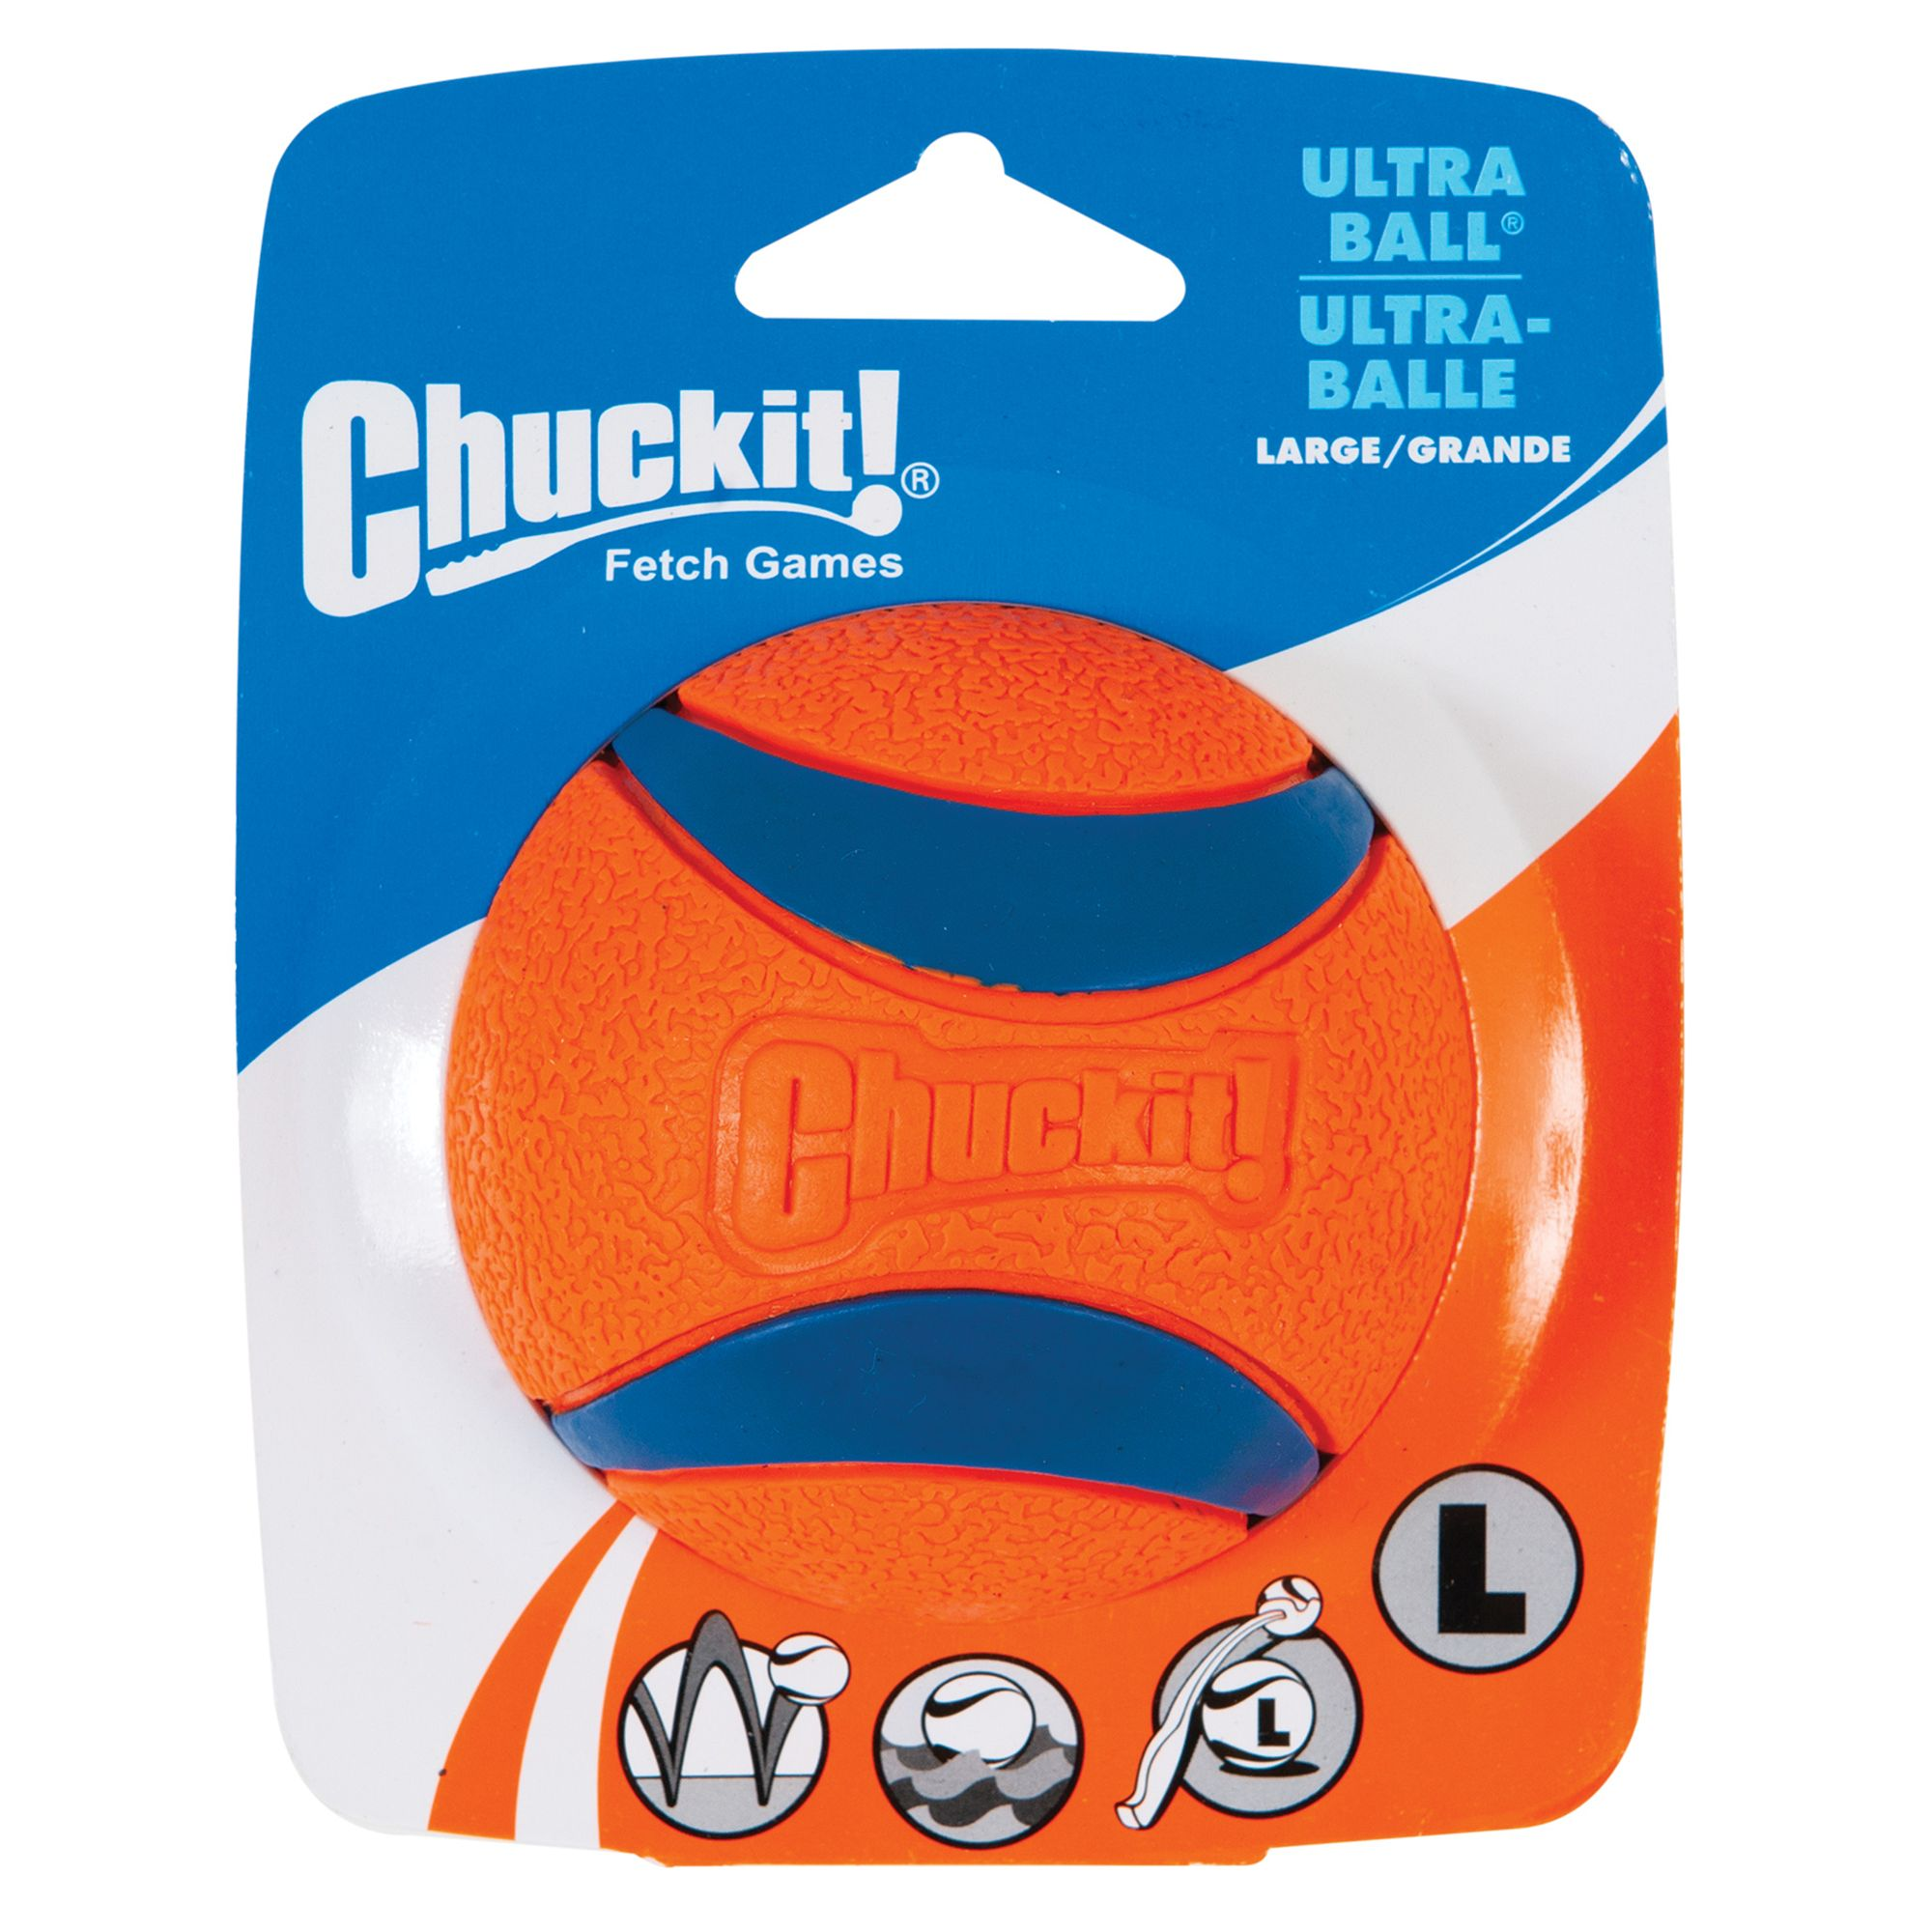 Chuckit! Ultra Ball Set Dog Toy size: Large, Multi-Color